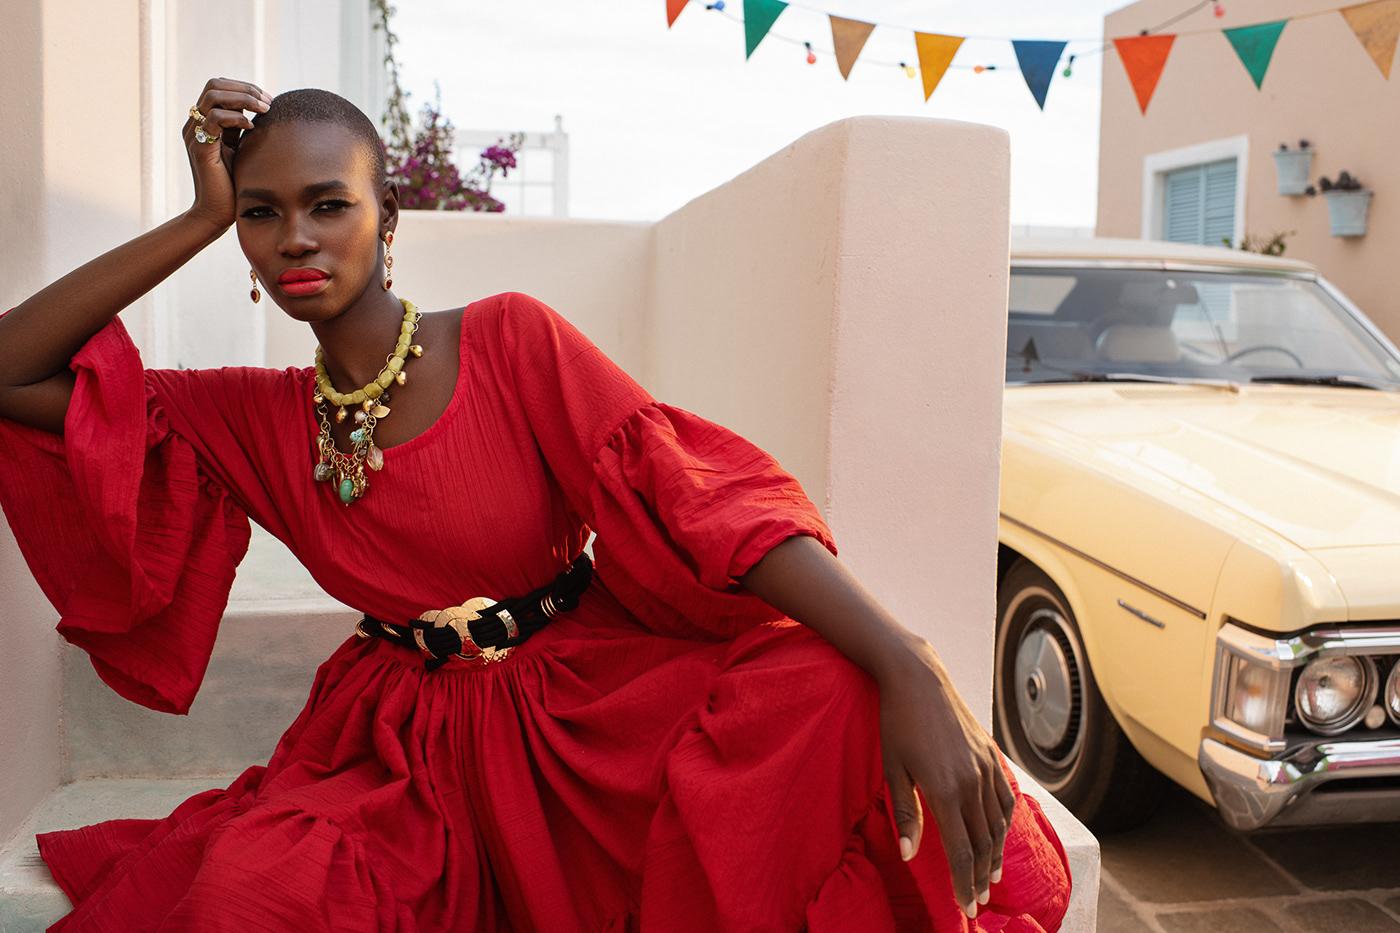 Fashion  photographer Photography  portrait